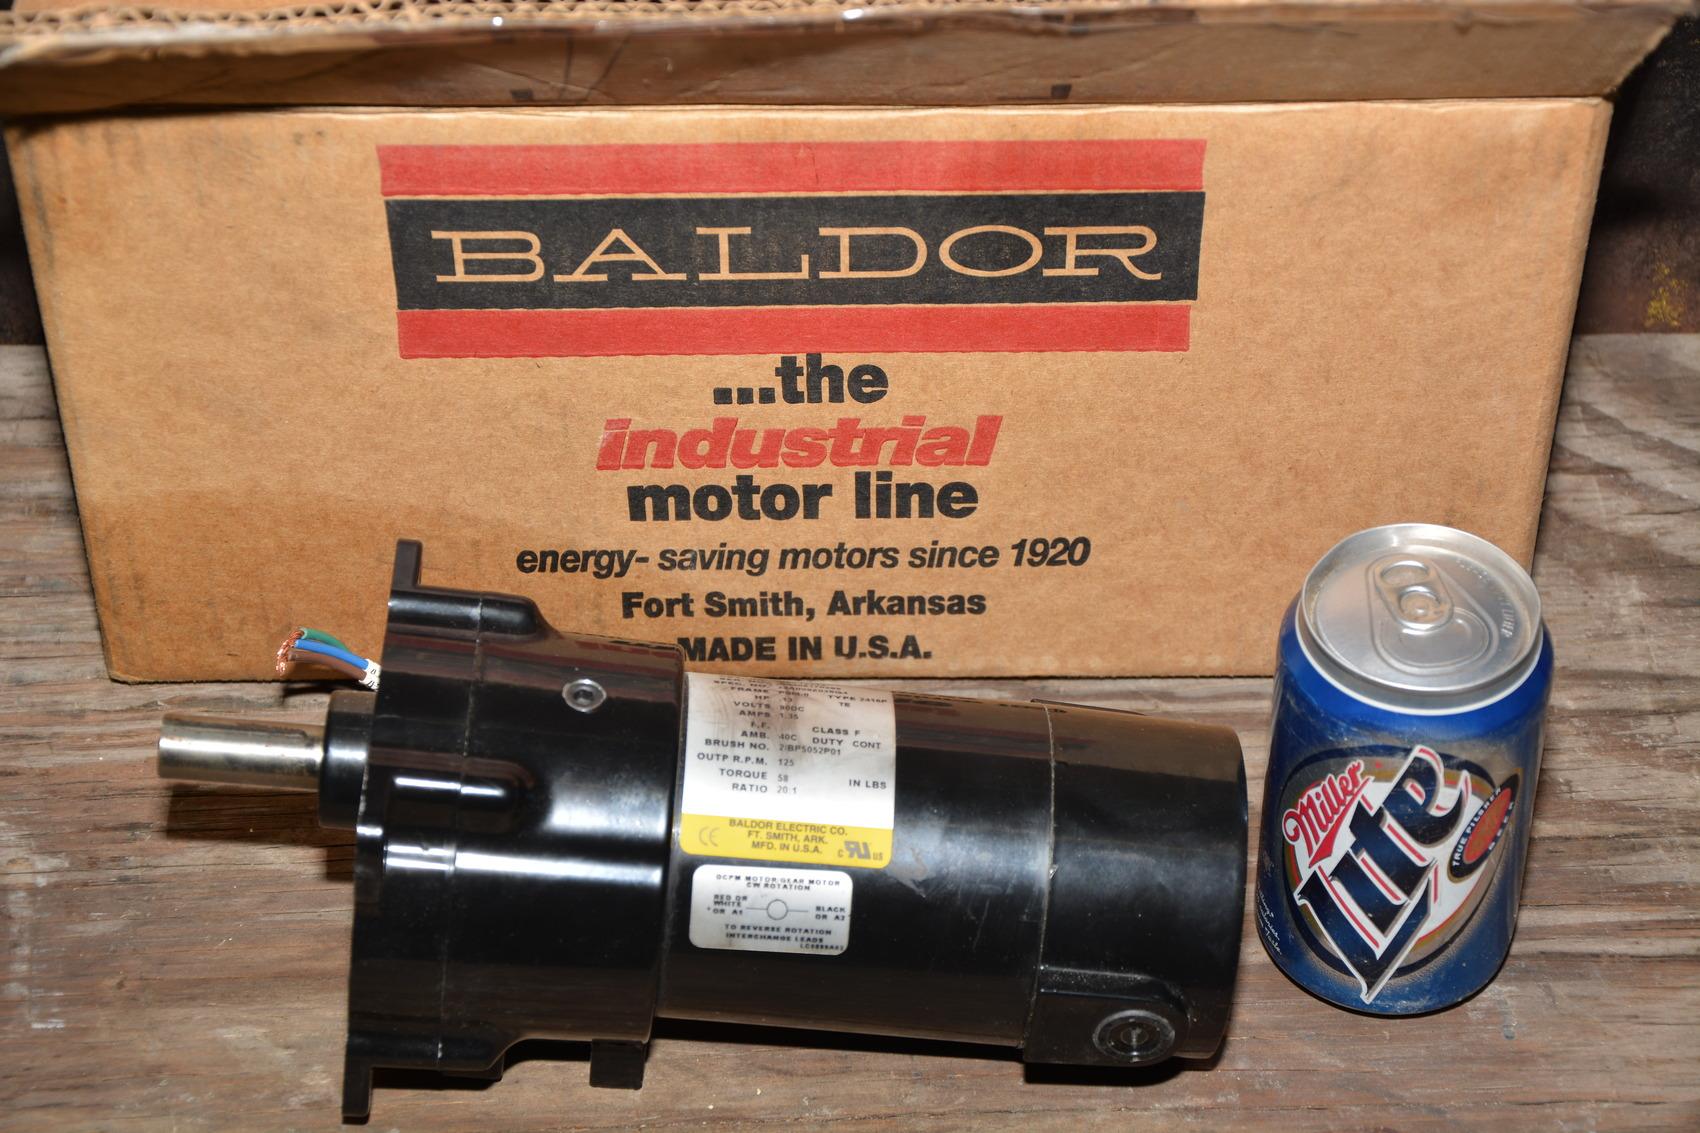 New baldor ctalog no gpp12543 hp dc gear motor 20 1 for Baldor gear motor catalog